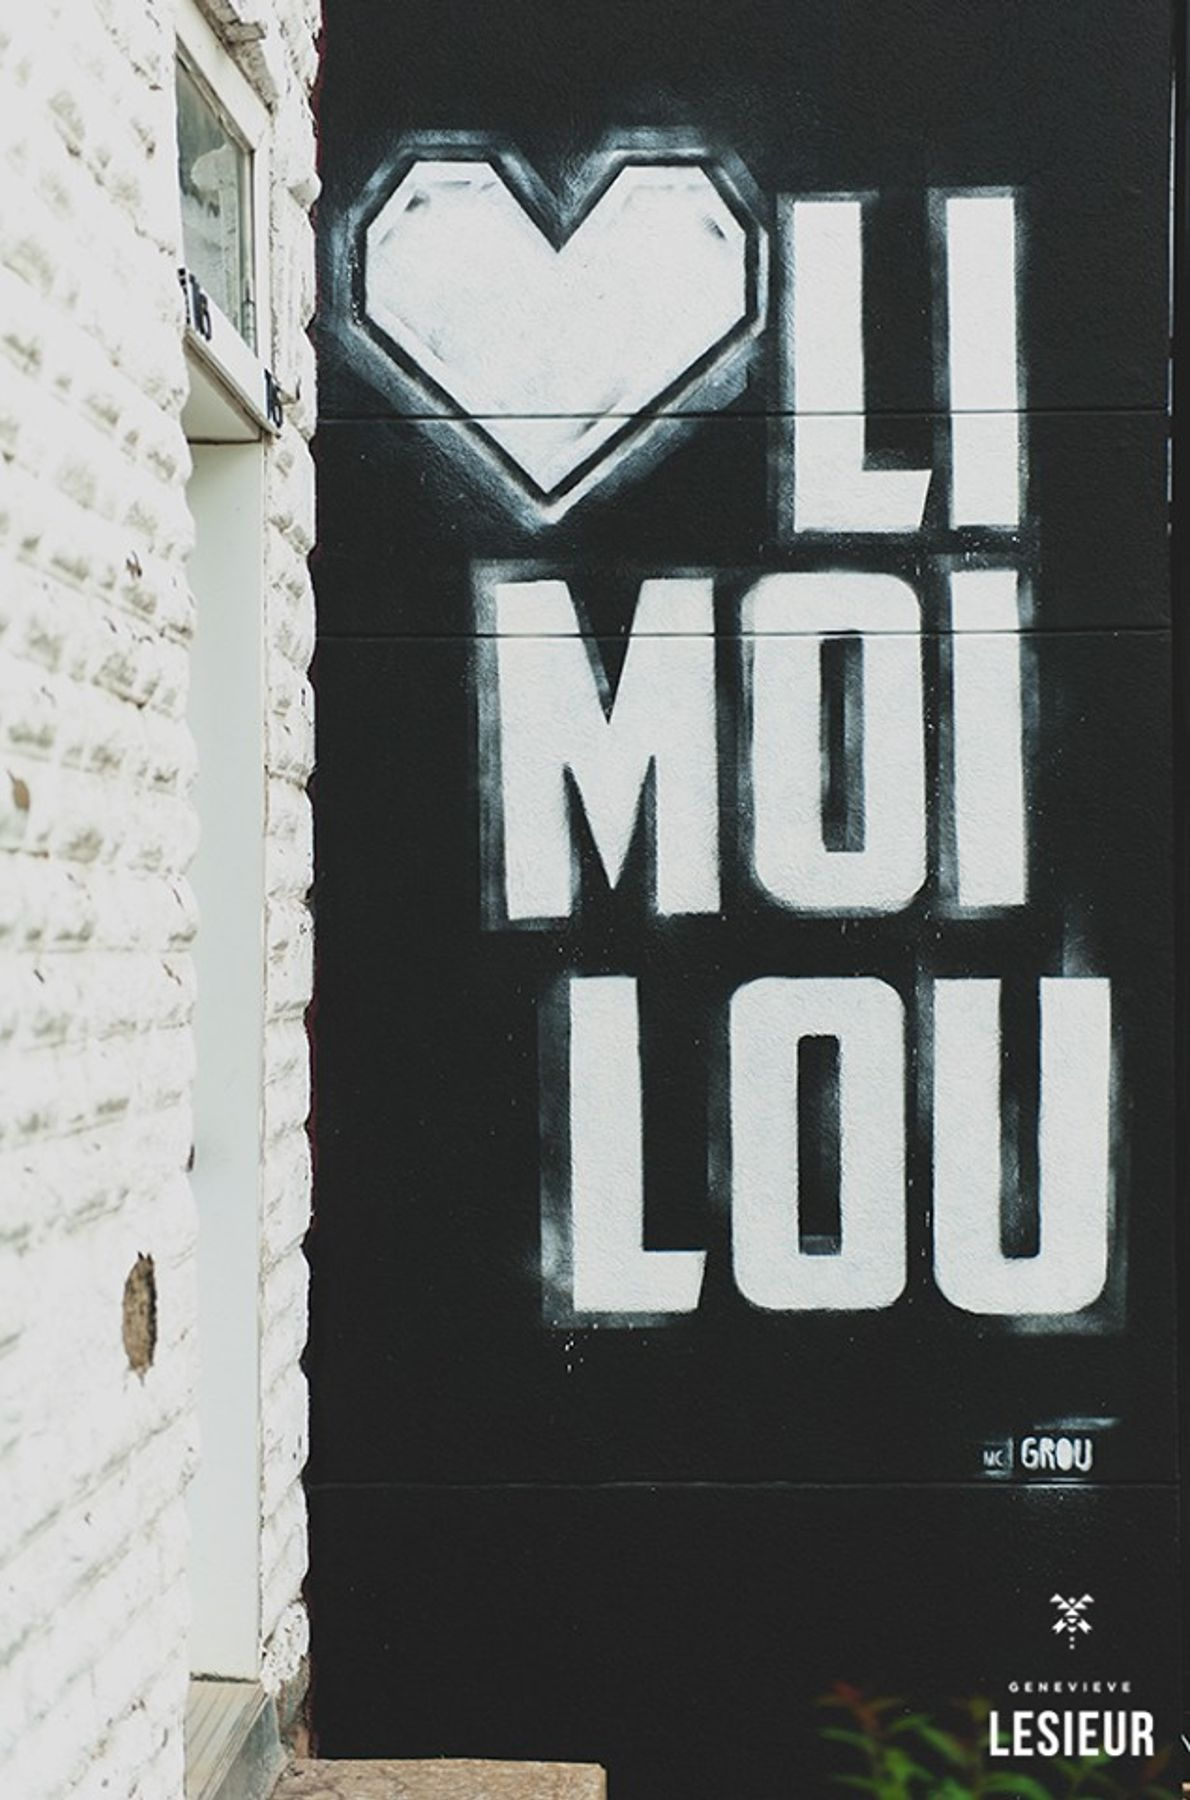 MC Grou's first mural in Limoilou (heart Limoilou).